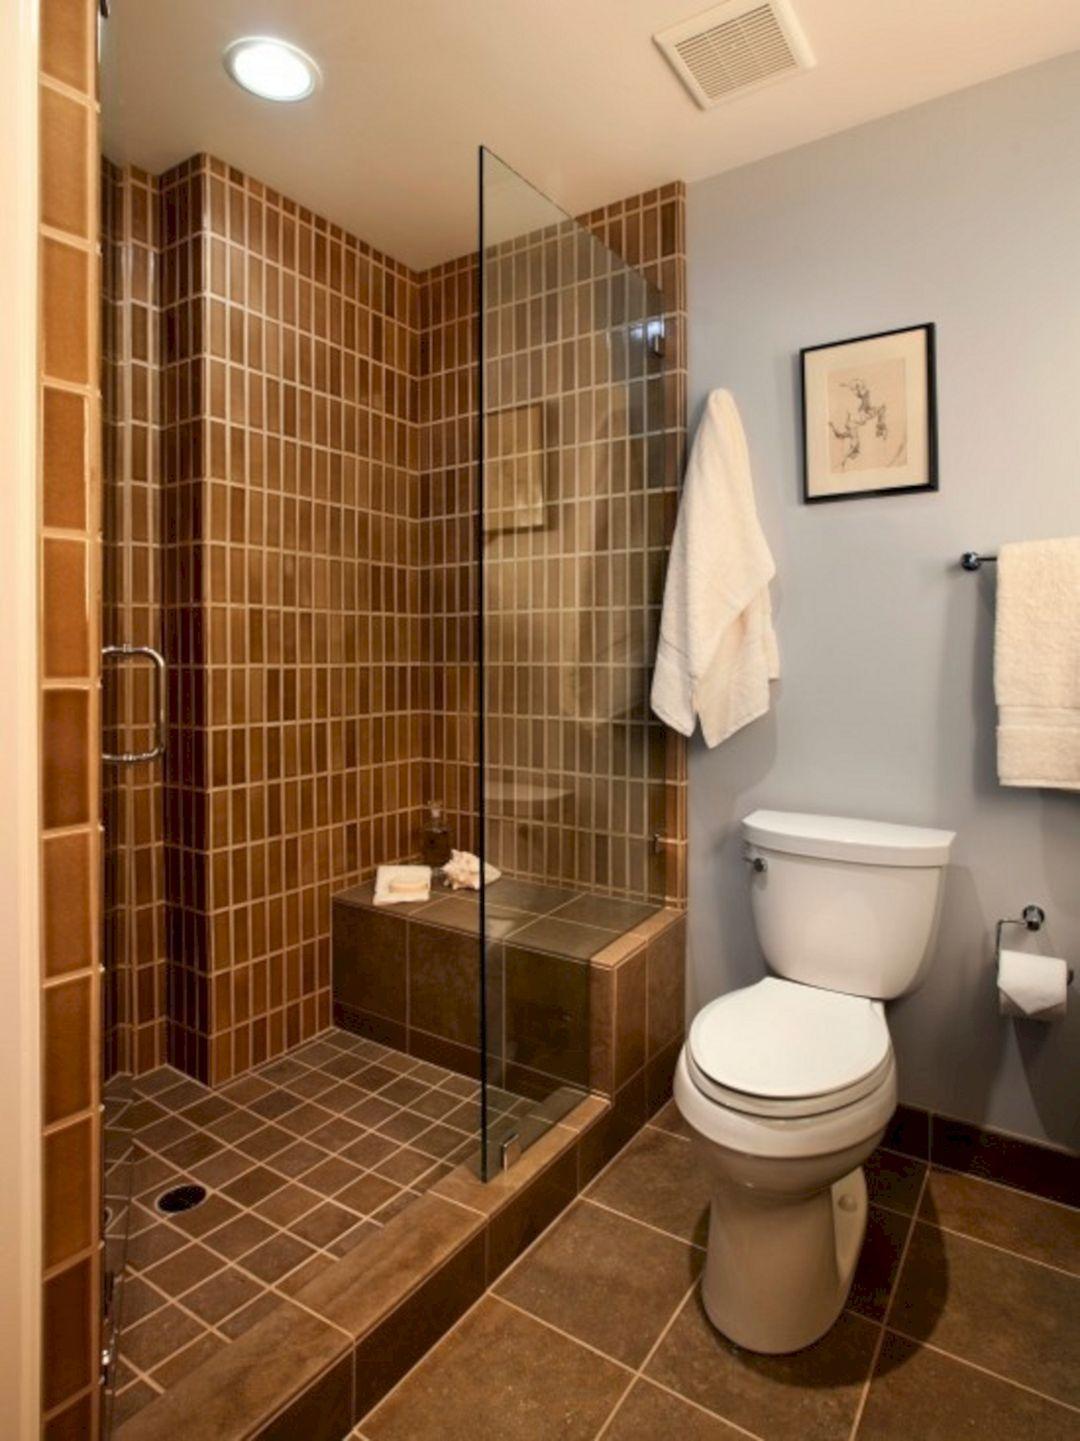 24 Top Doorless Shower Design For Small Bathroom Ideas Bathroom Design Small Small Bathroom Doorless Shower Design